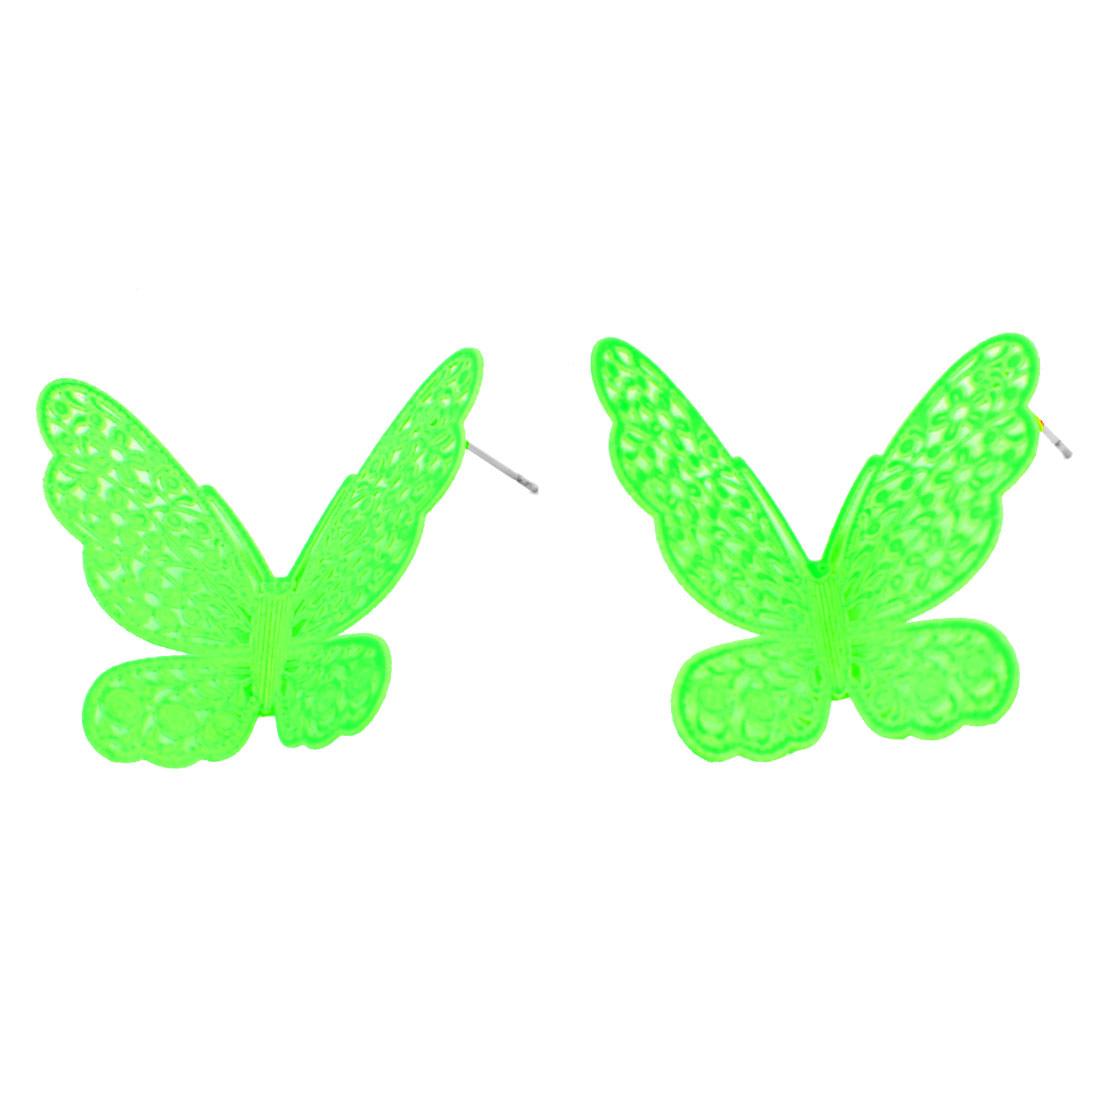 Pair Ear Decor Green Butterfly Design Shaped Earrings Ear Ring for Lady